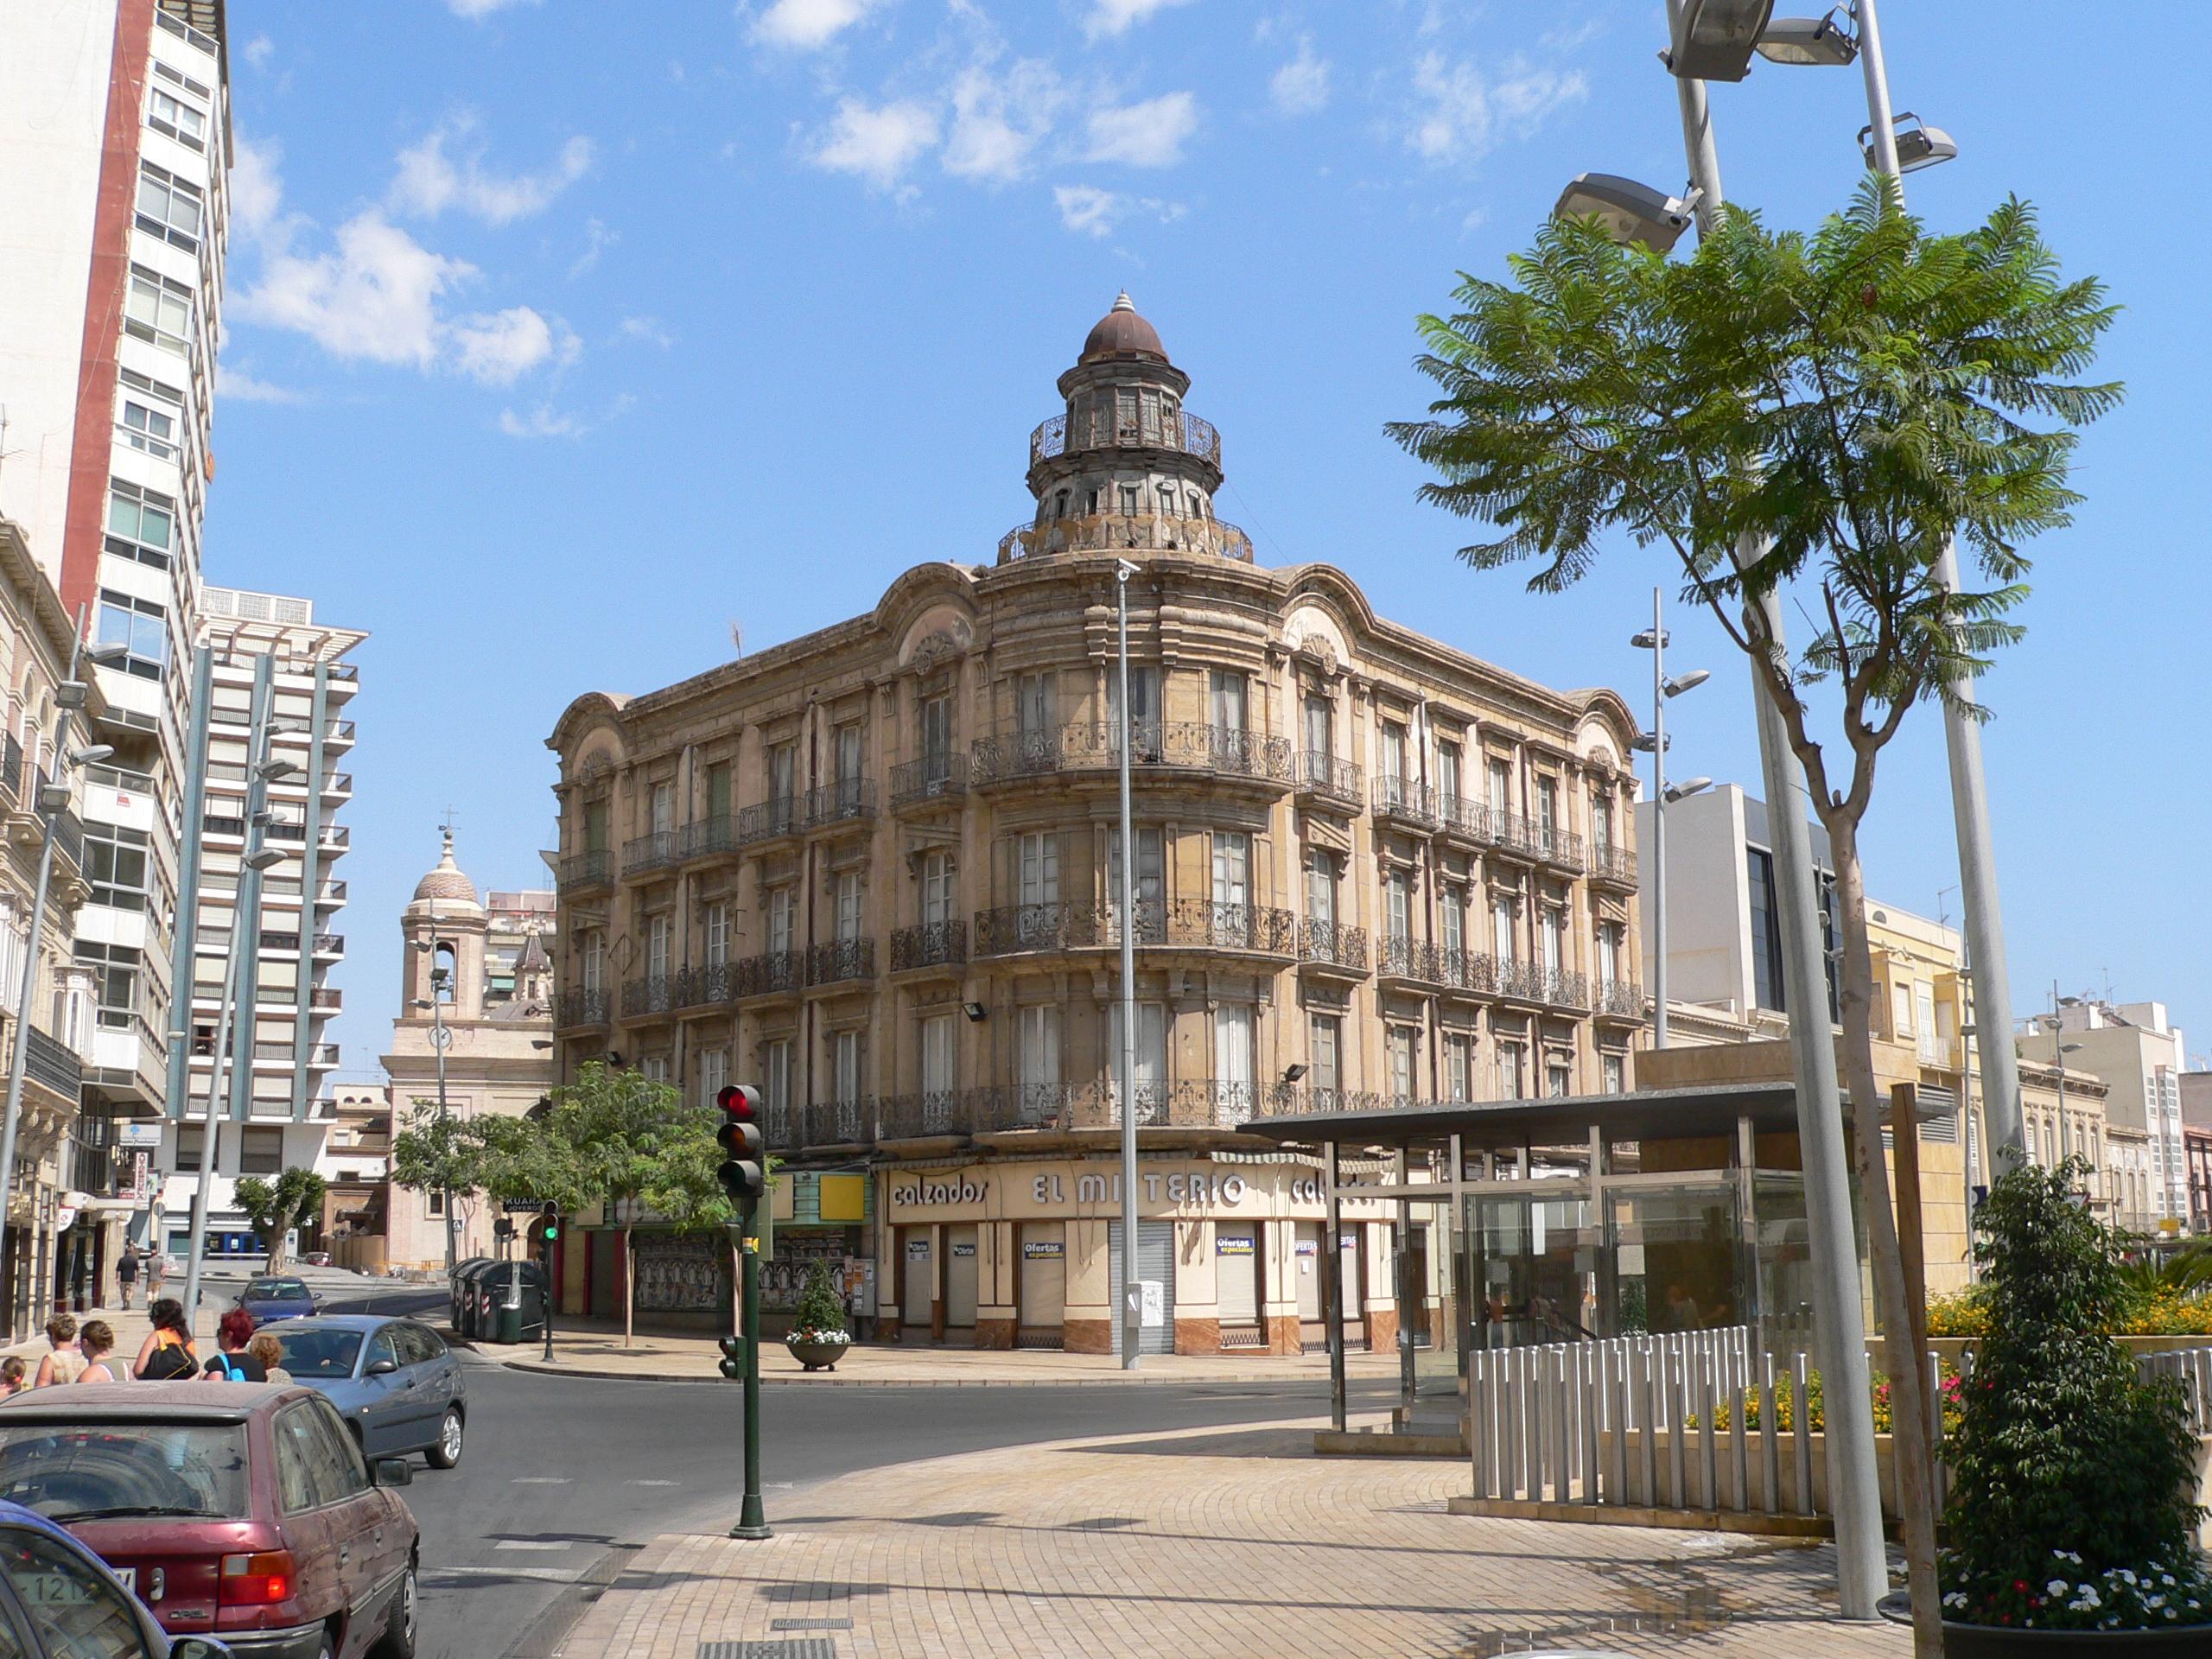 File:Almeria Puerta de Purchena fcm.jpg.